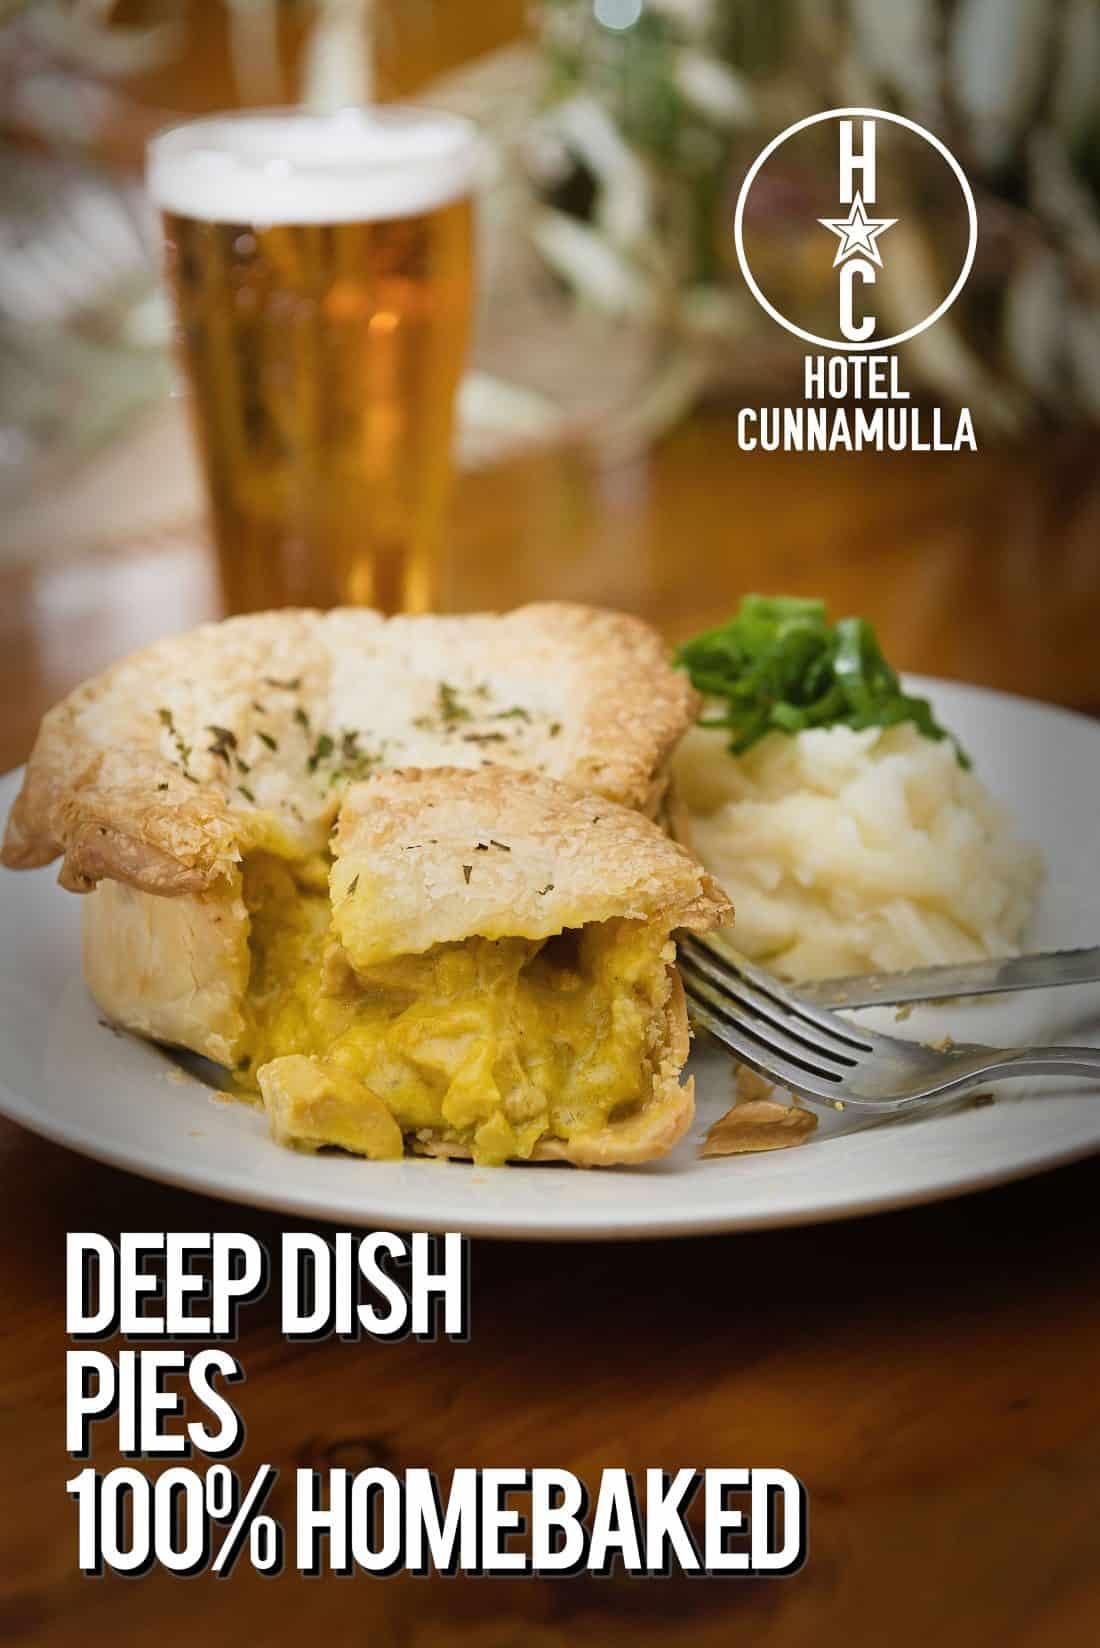 Hotel Cunnamulla Restaurant Meals Pies